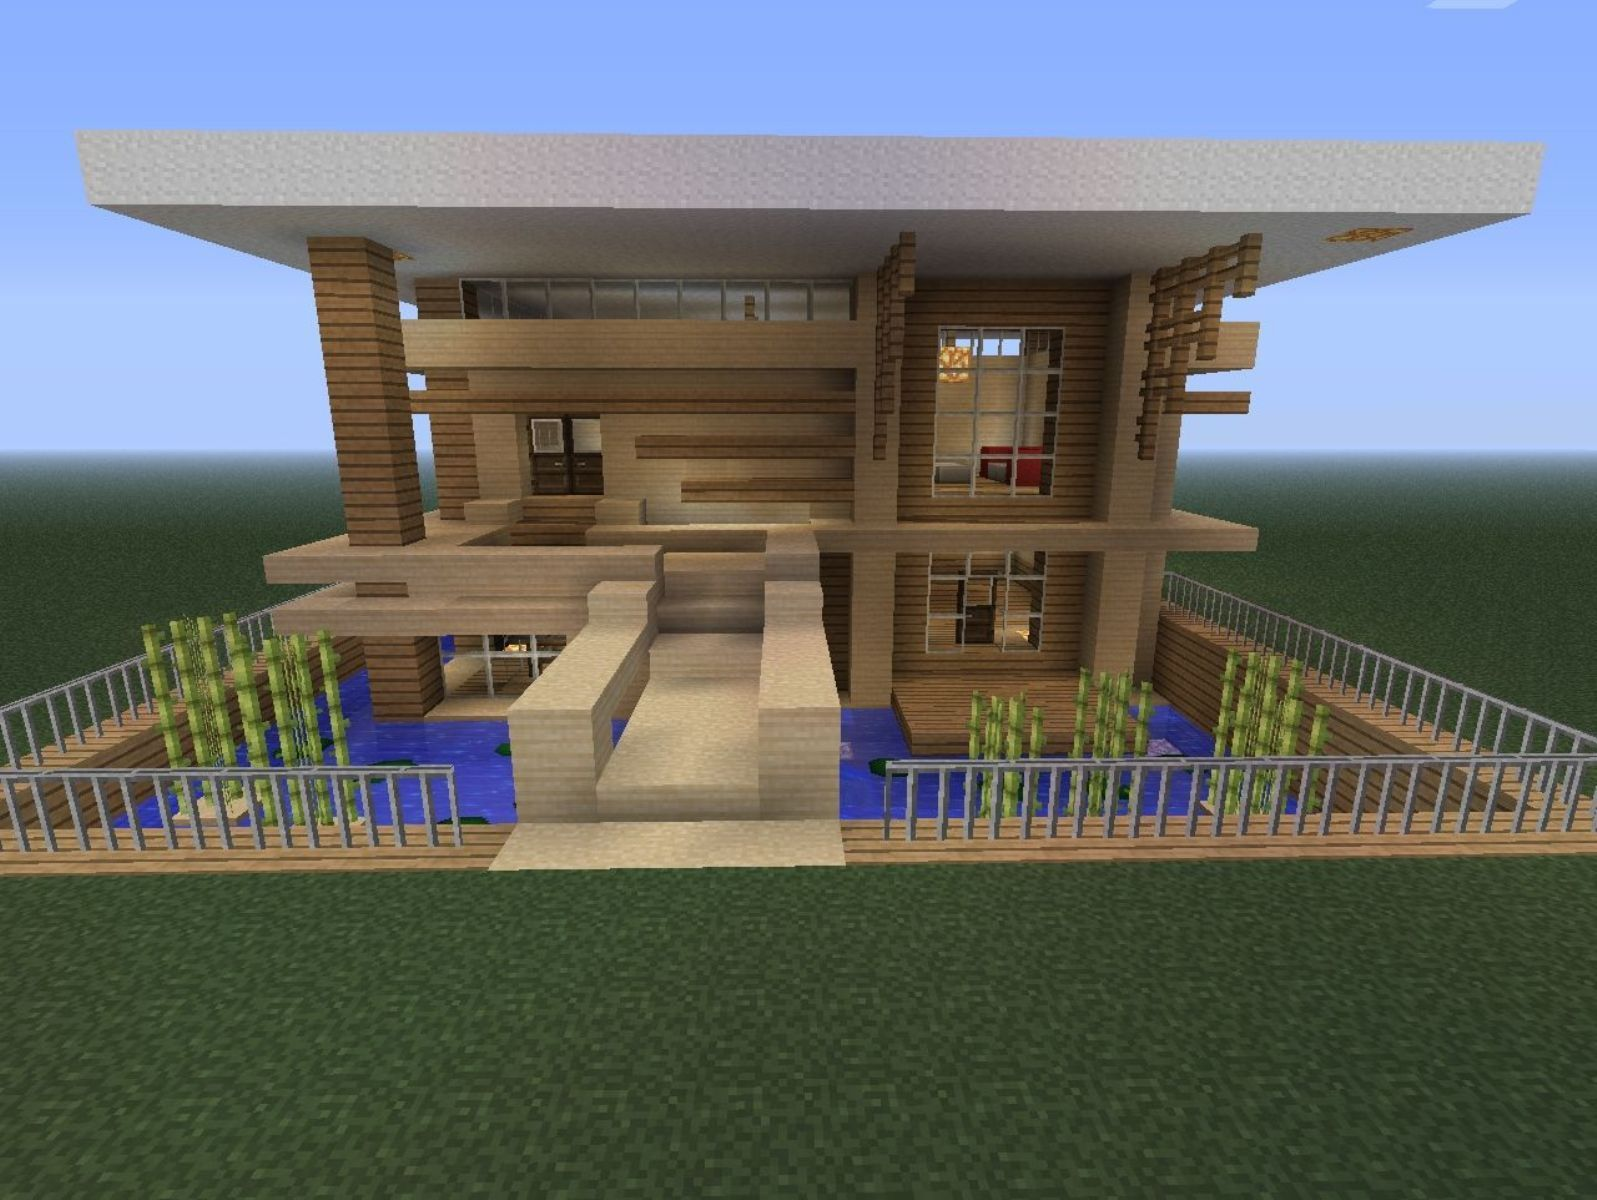 Minecraft houses ideas bleh pinterest minecraft for Minecraft simple modern house blueprints